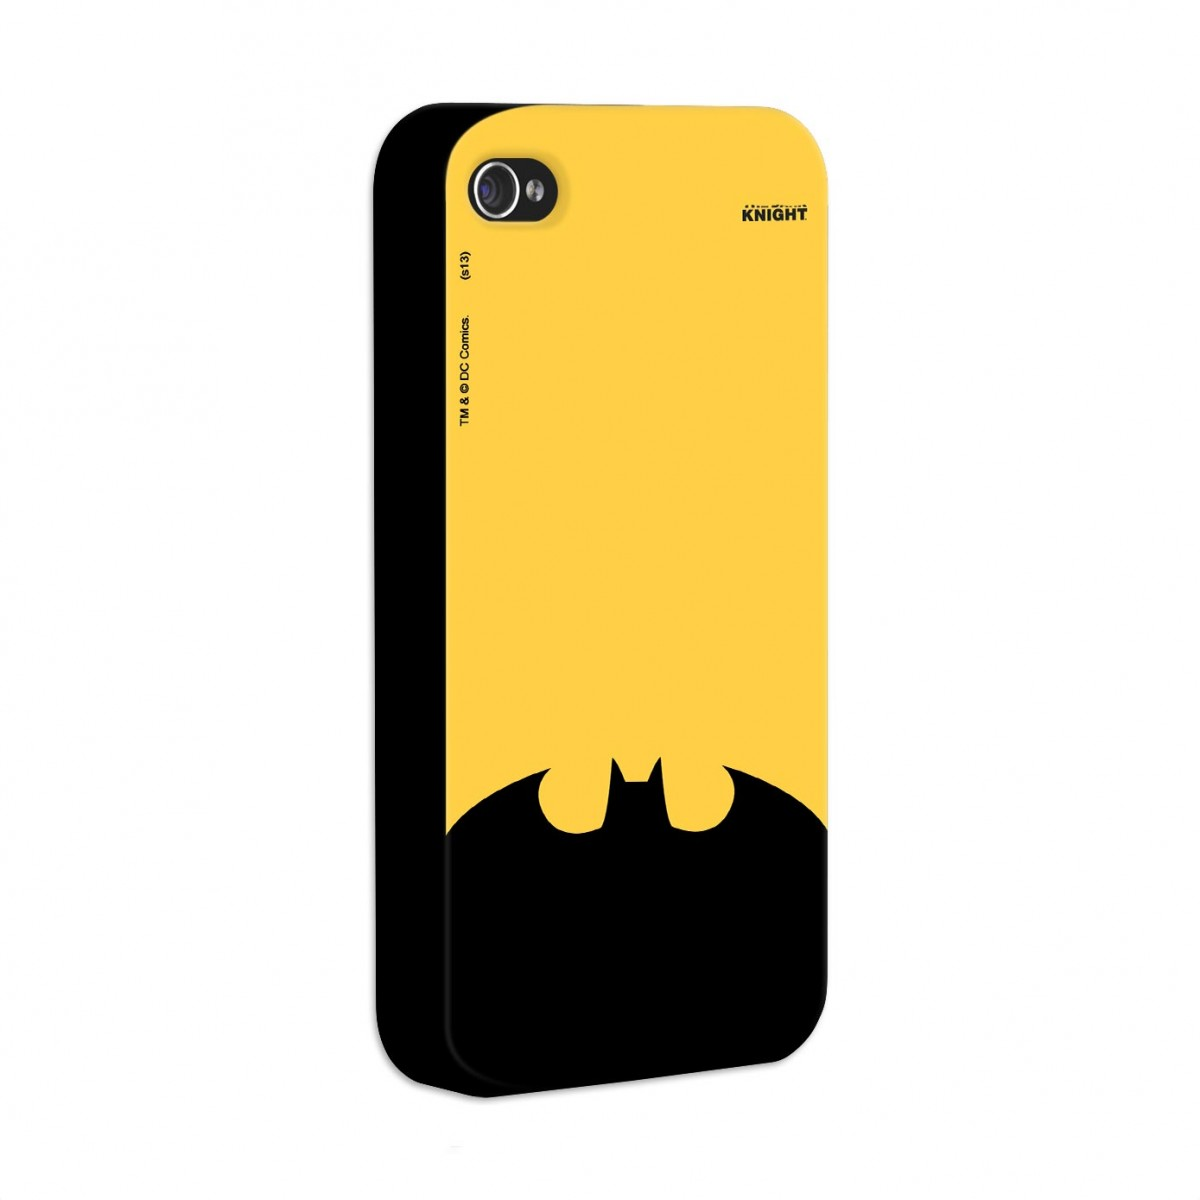 Kit Com 3 Capas de iPhone 4/4S Batman - The Dark Knight